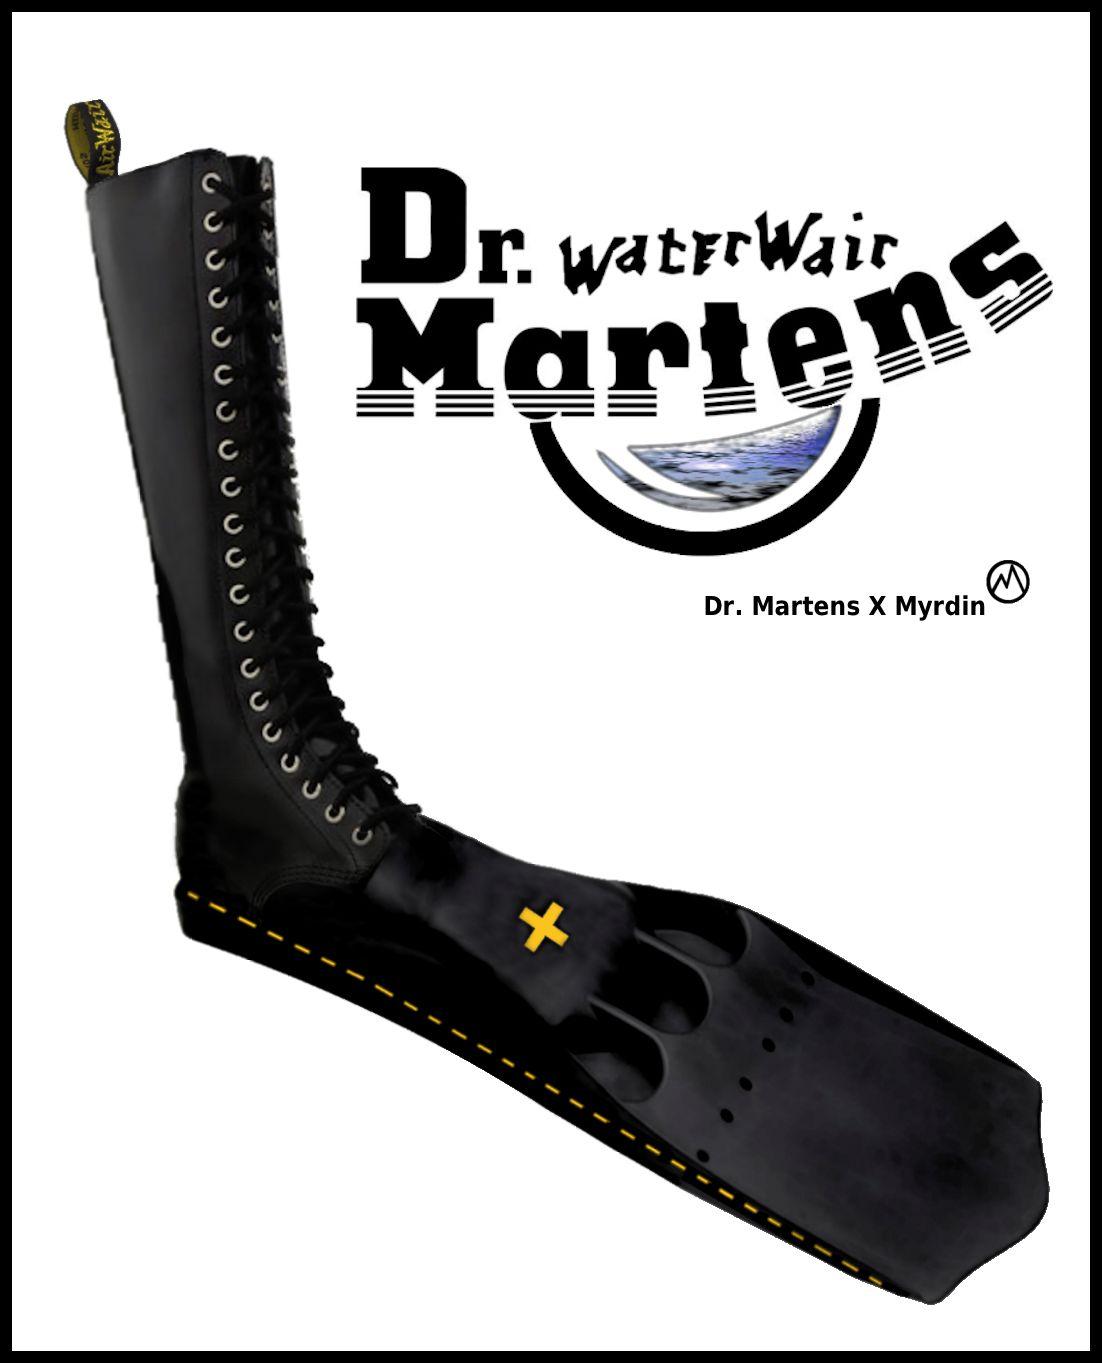 croc martins